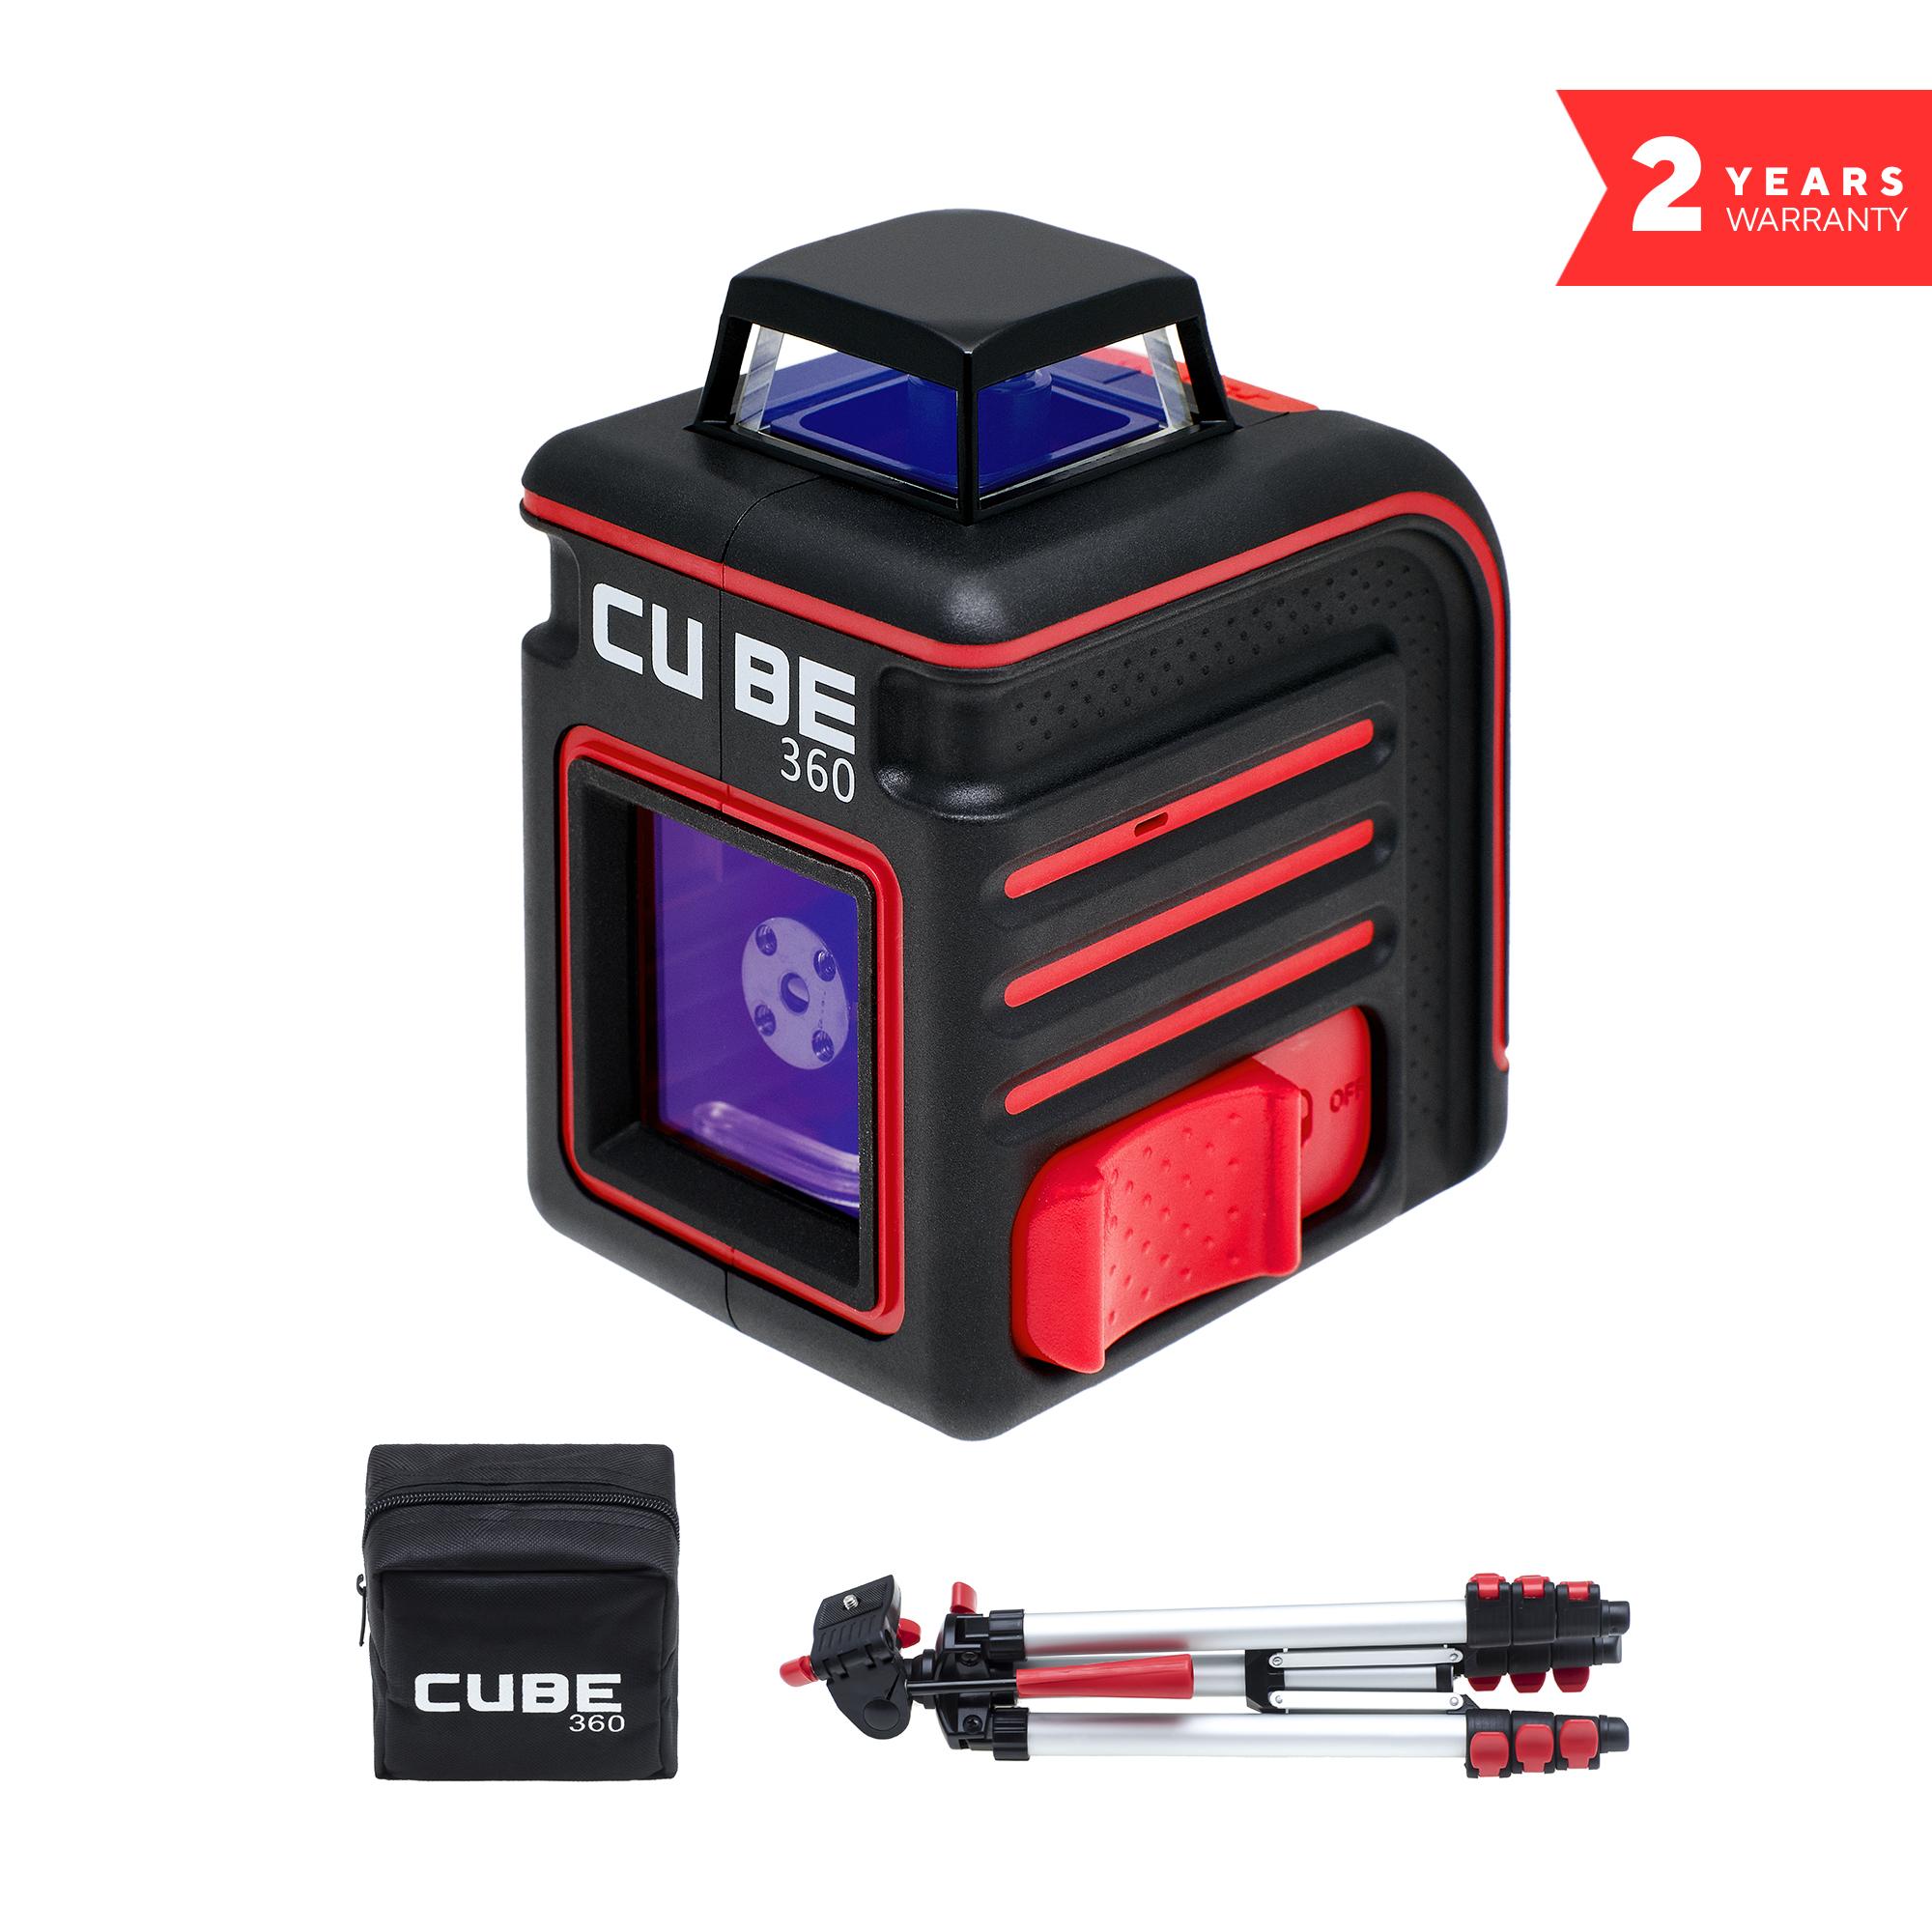 Laser Level ADA CUBE 360 PROFESSIONAL EDITION